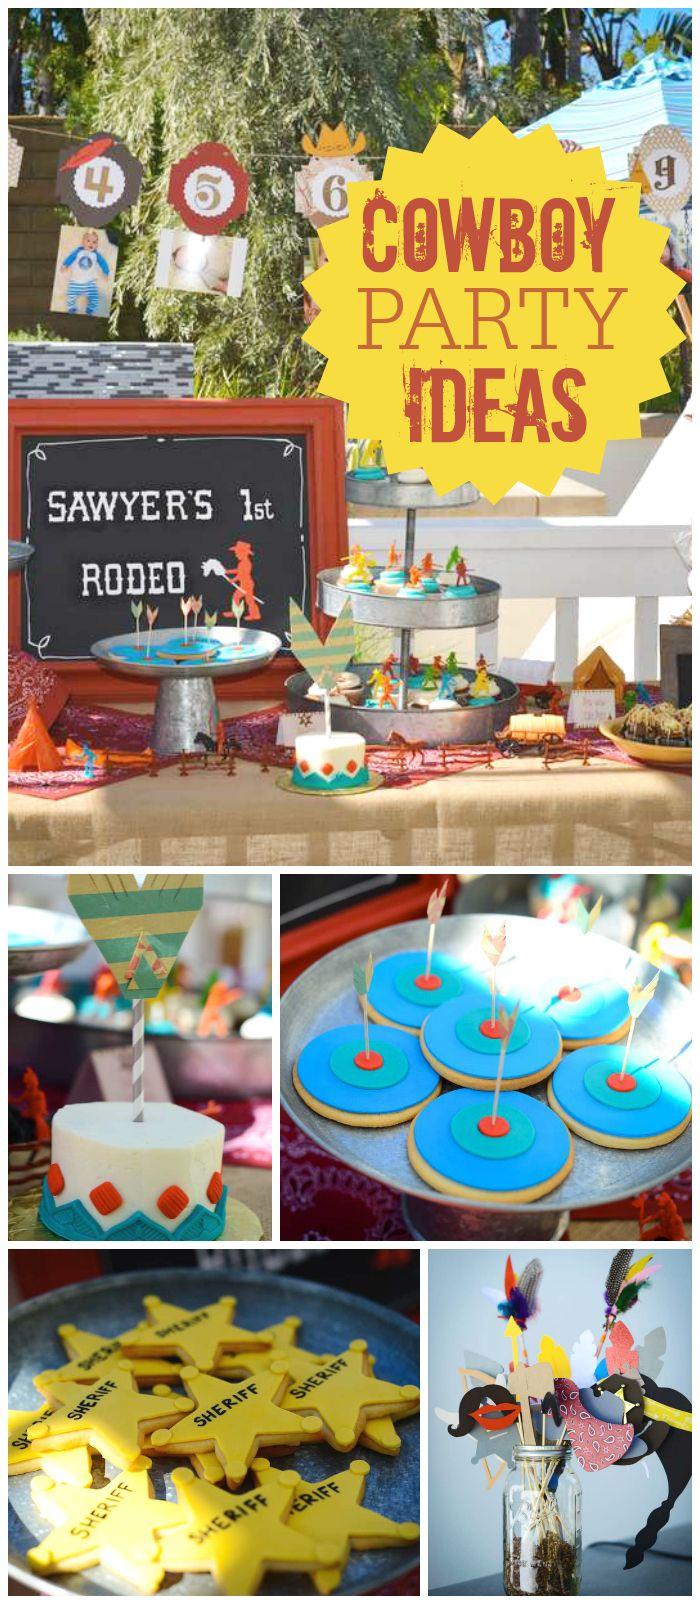 Cowboy party food ideas - Cowboys Indians Birthday Sawyer S 1st Birthday